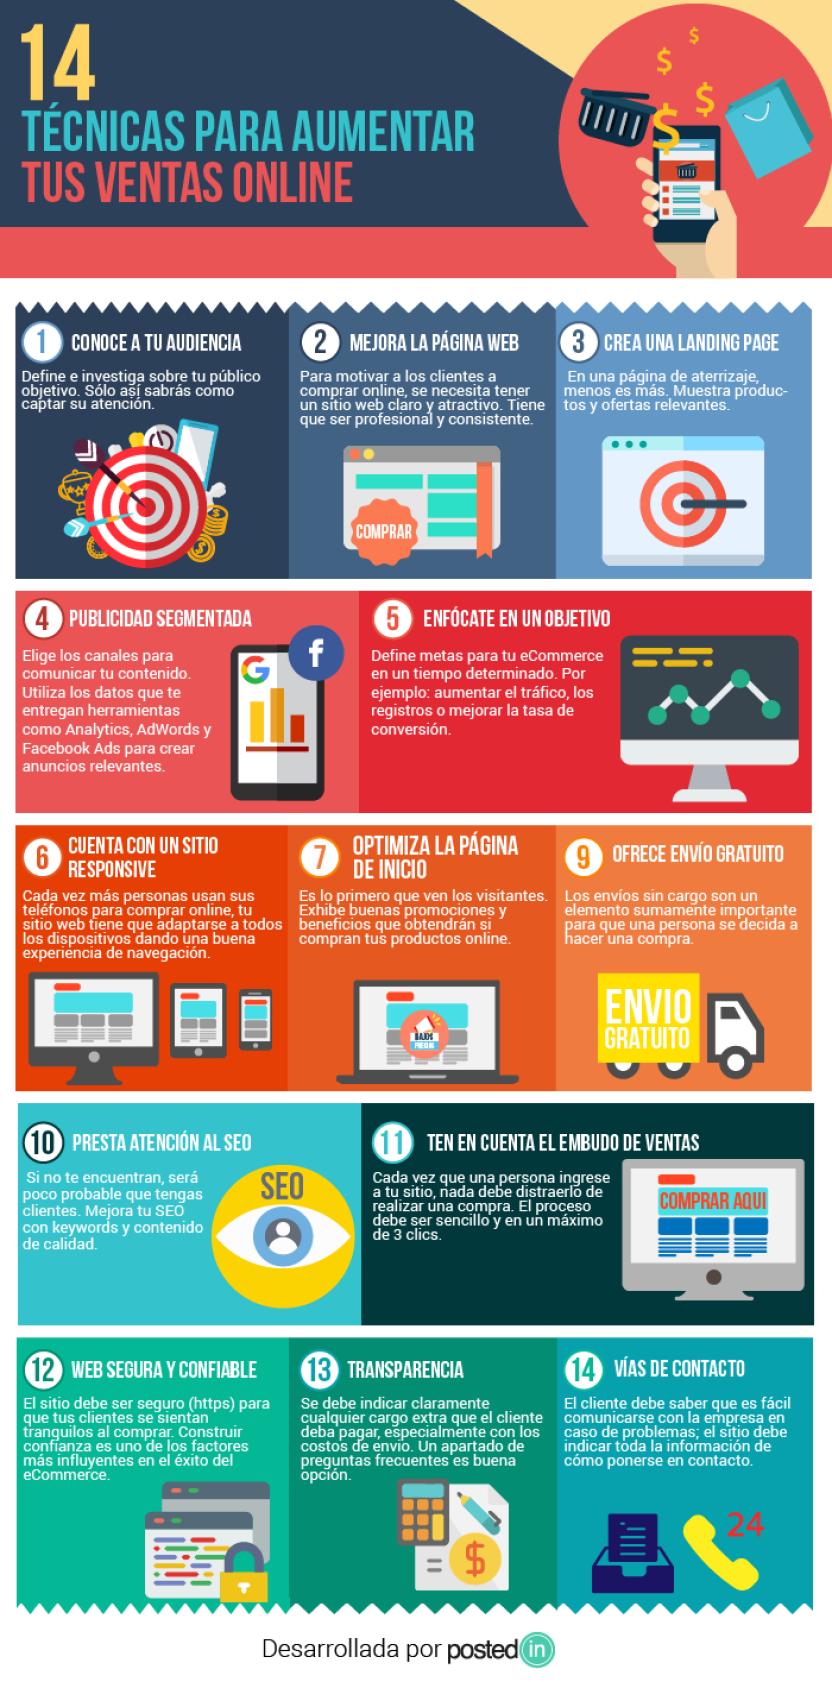 14 técnicas para aumentar tus ventas online